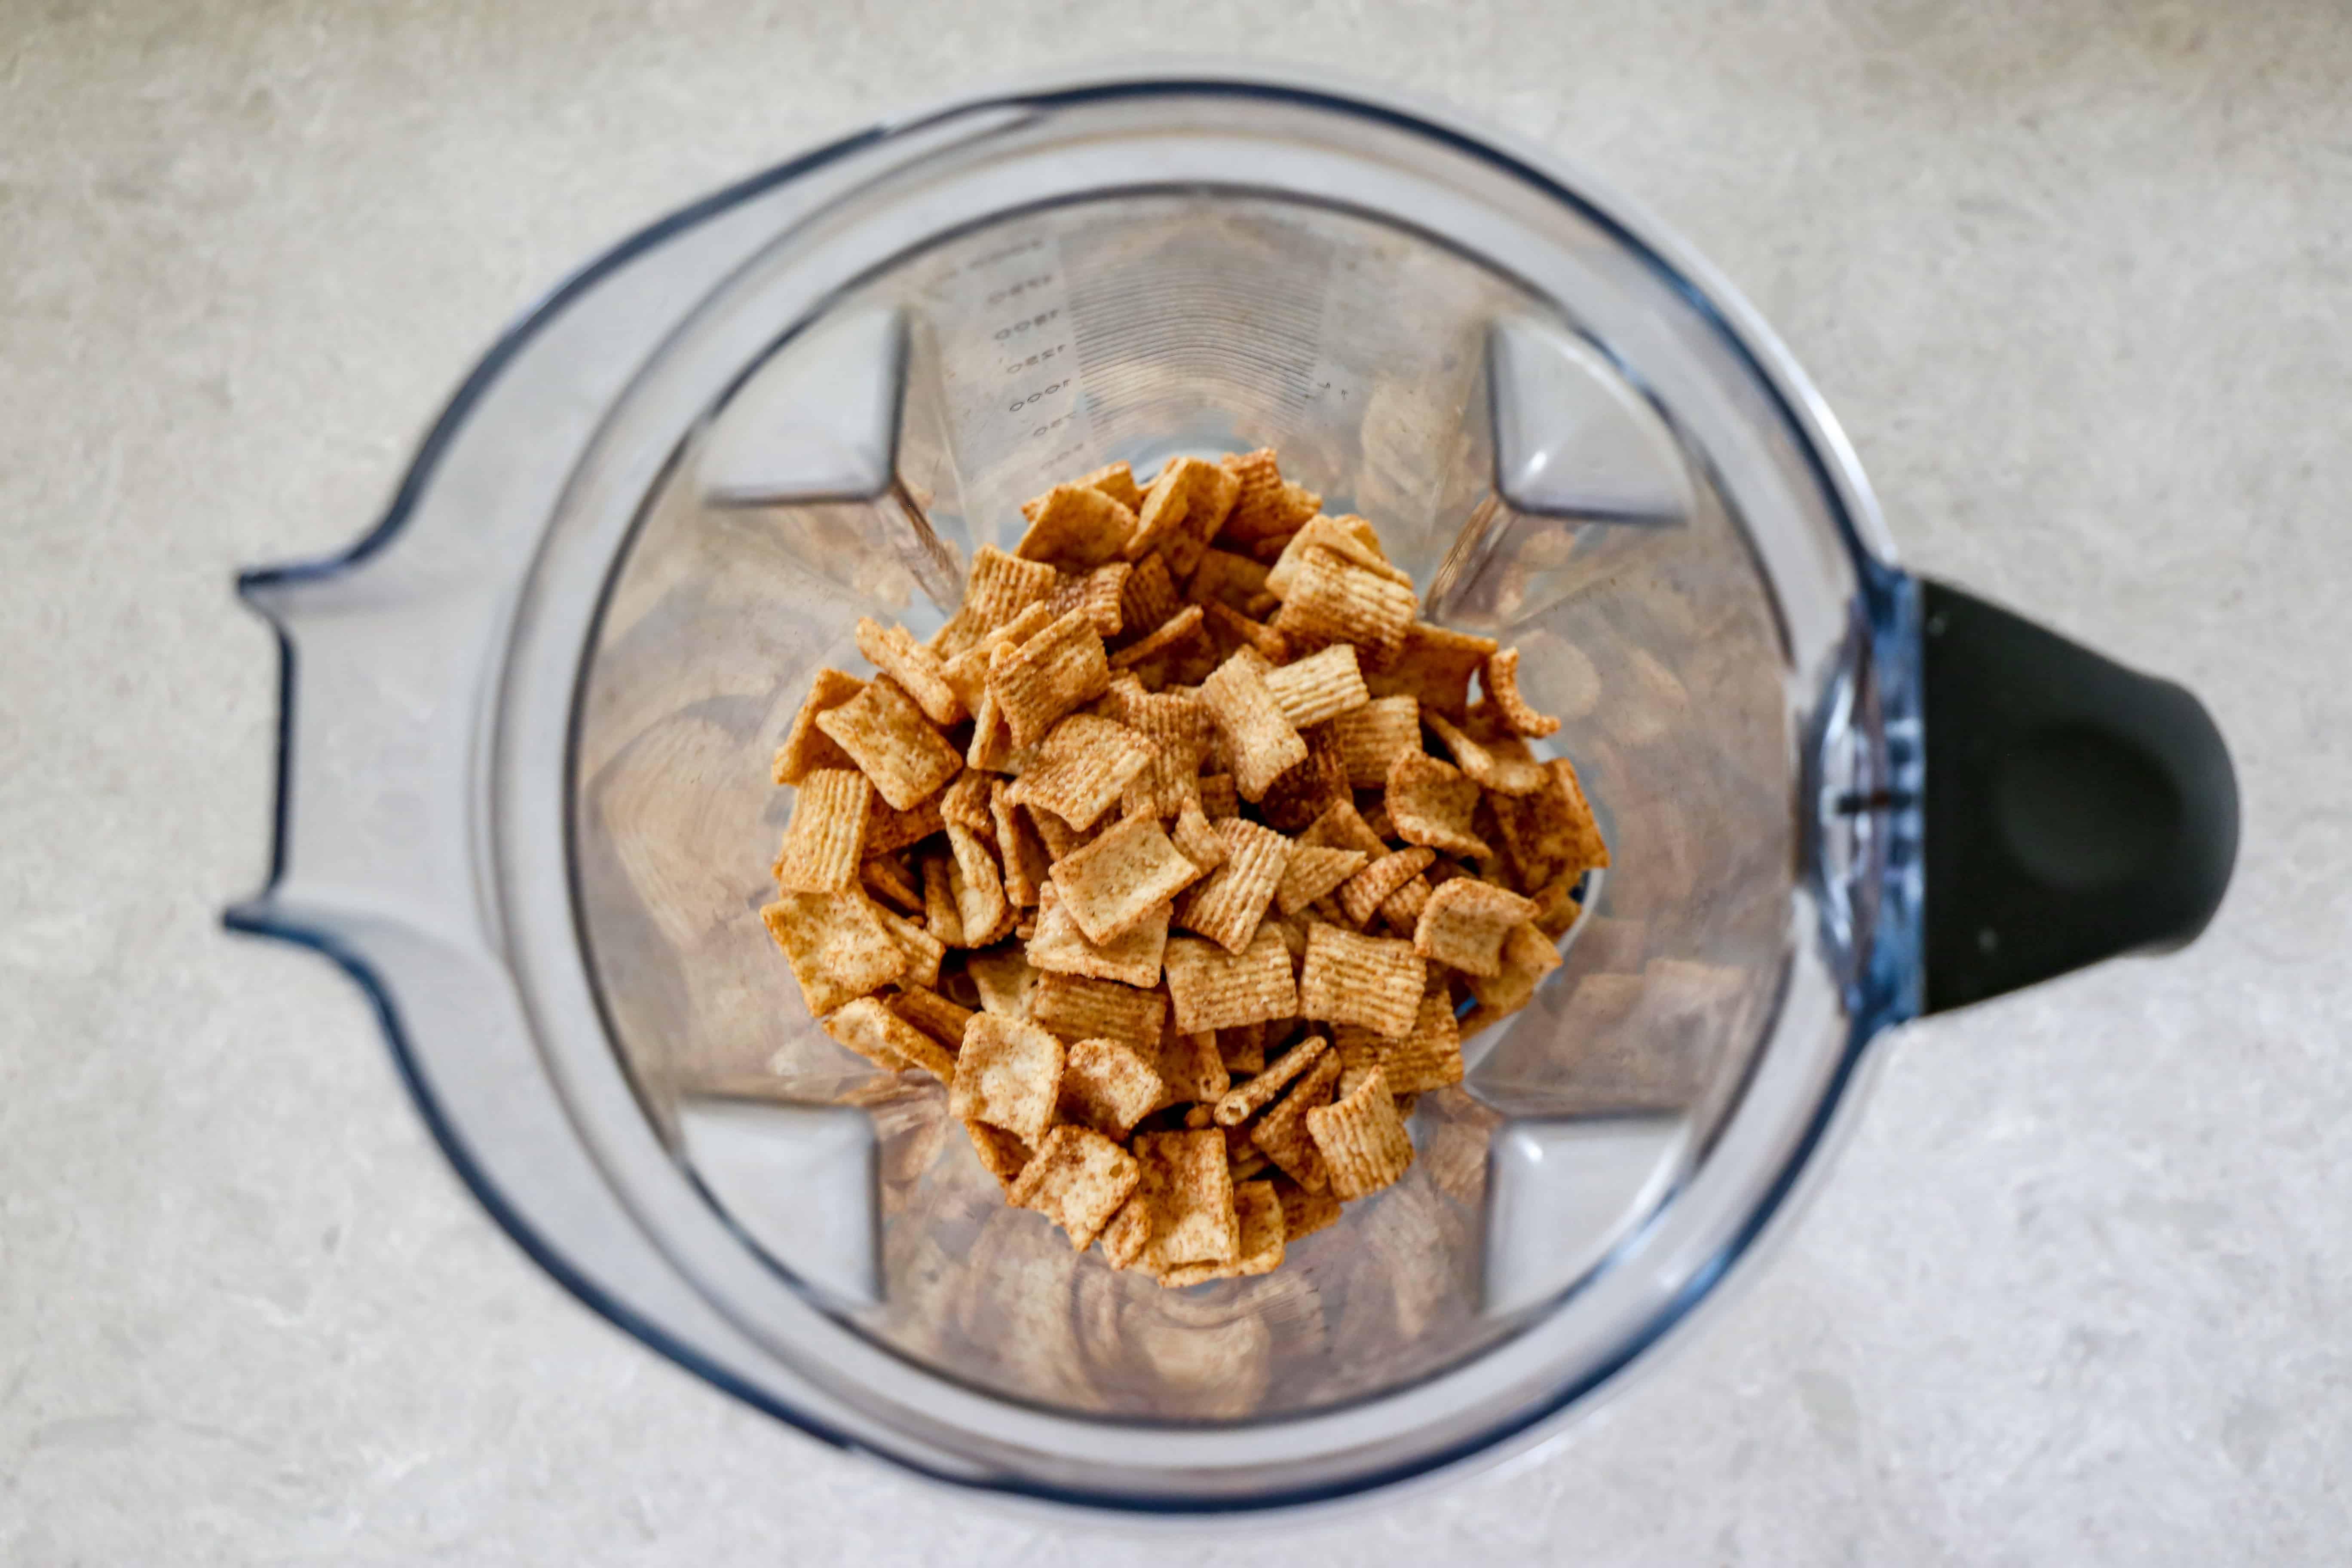 cinnamon cereal in a blender